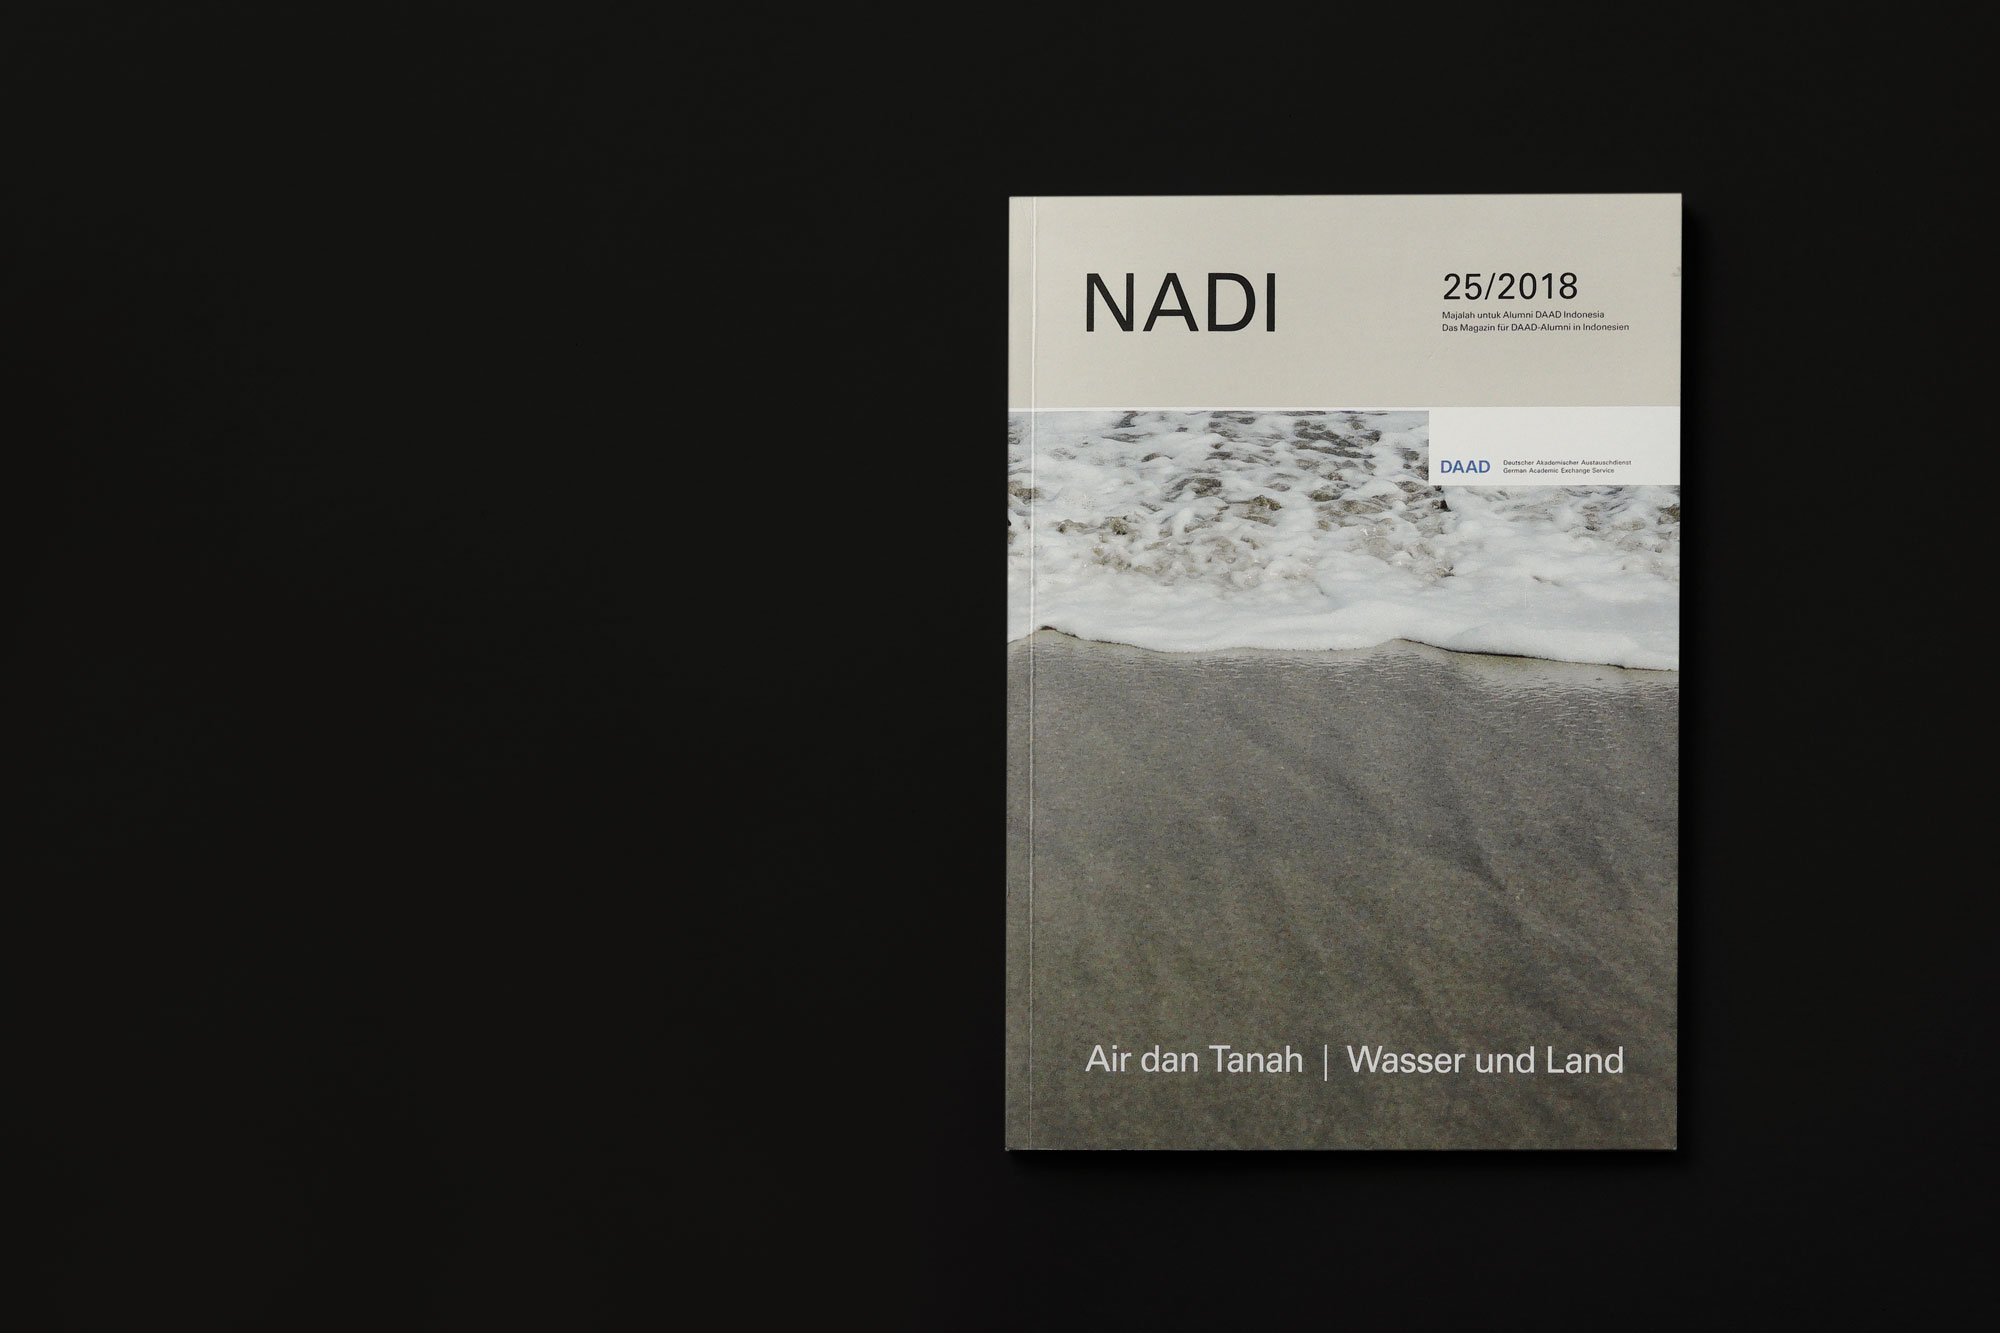 nadi-2018-01